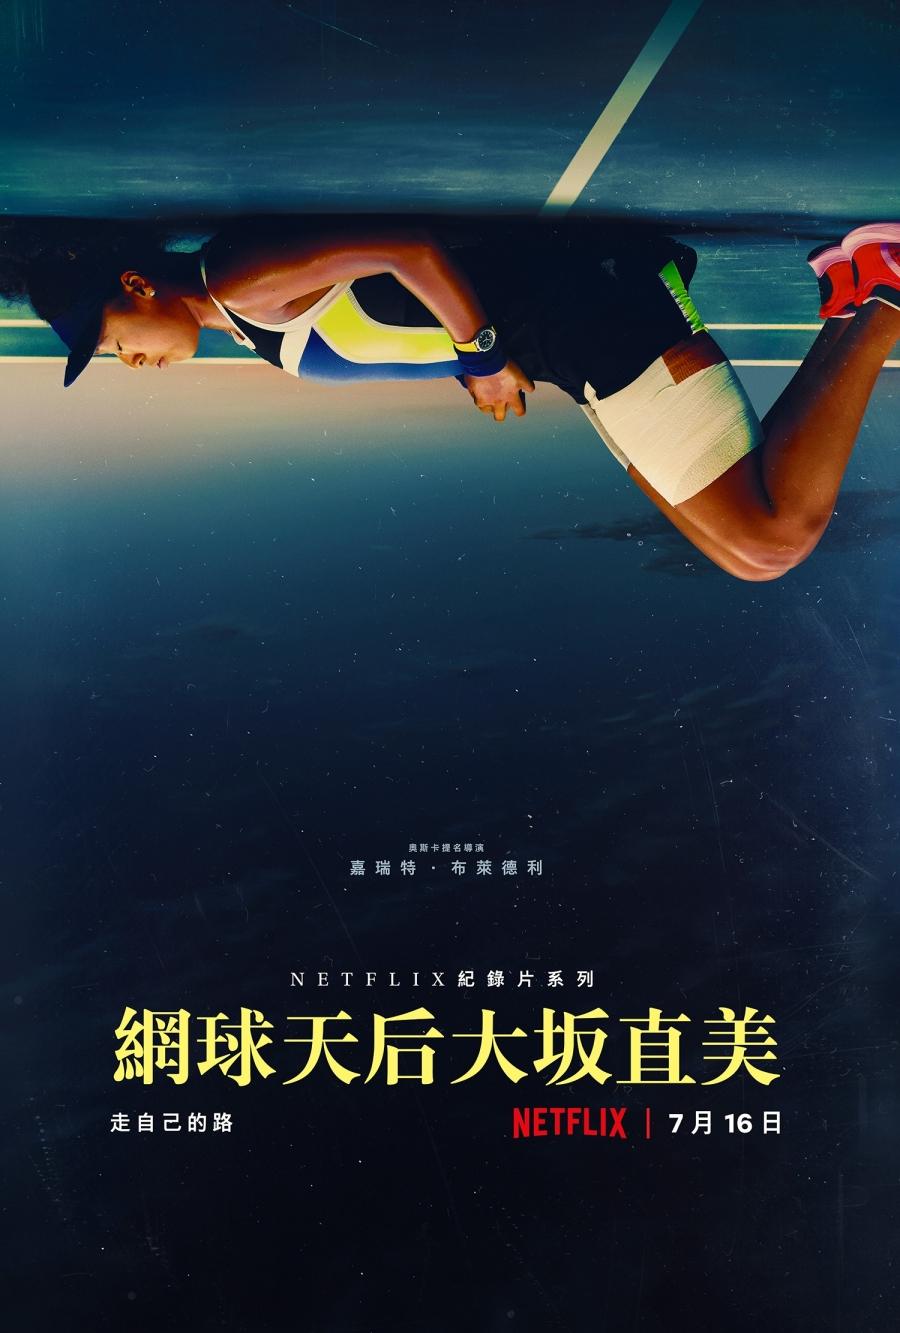 Netflix 網球天后大阪直美 01.jpg